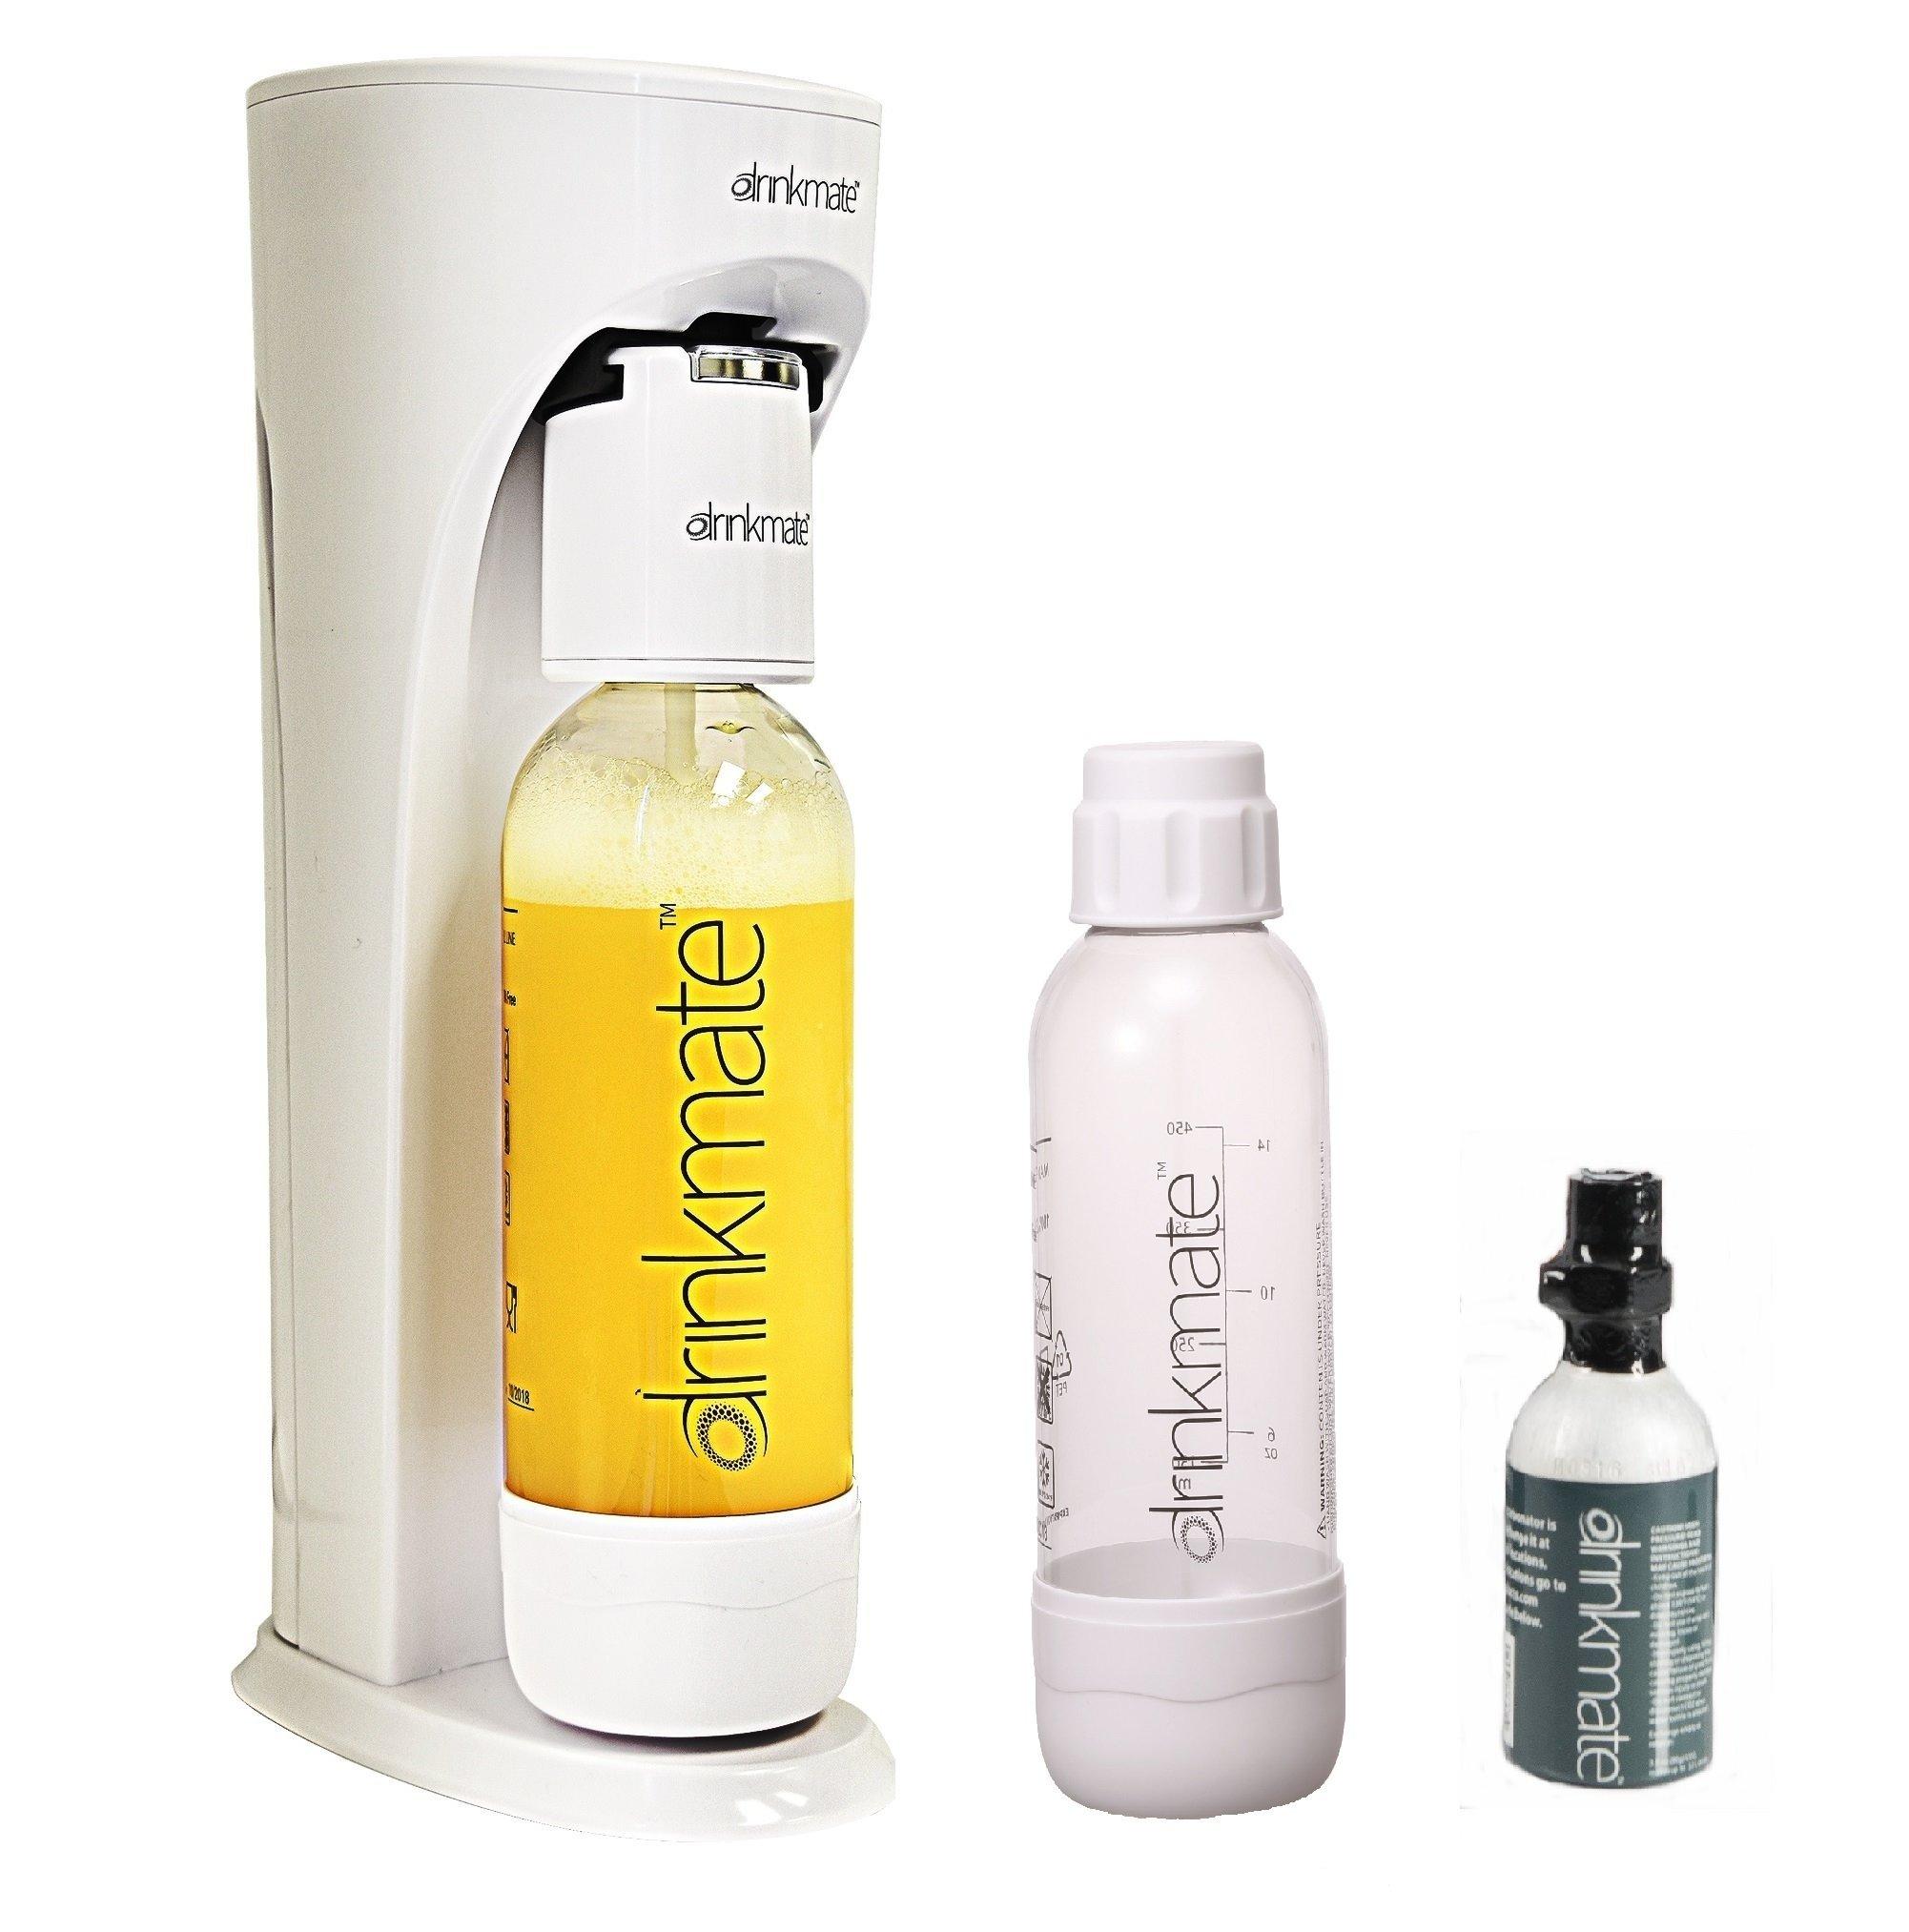 Drinkmate Beverage Carbonation Maker with 3 oz Cylinder Includes Two BPA-free Carbonation bottles, 1Litre and half litre bottles (White) by Drinkmate (Image #1)